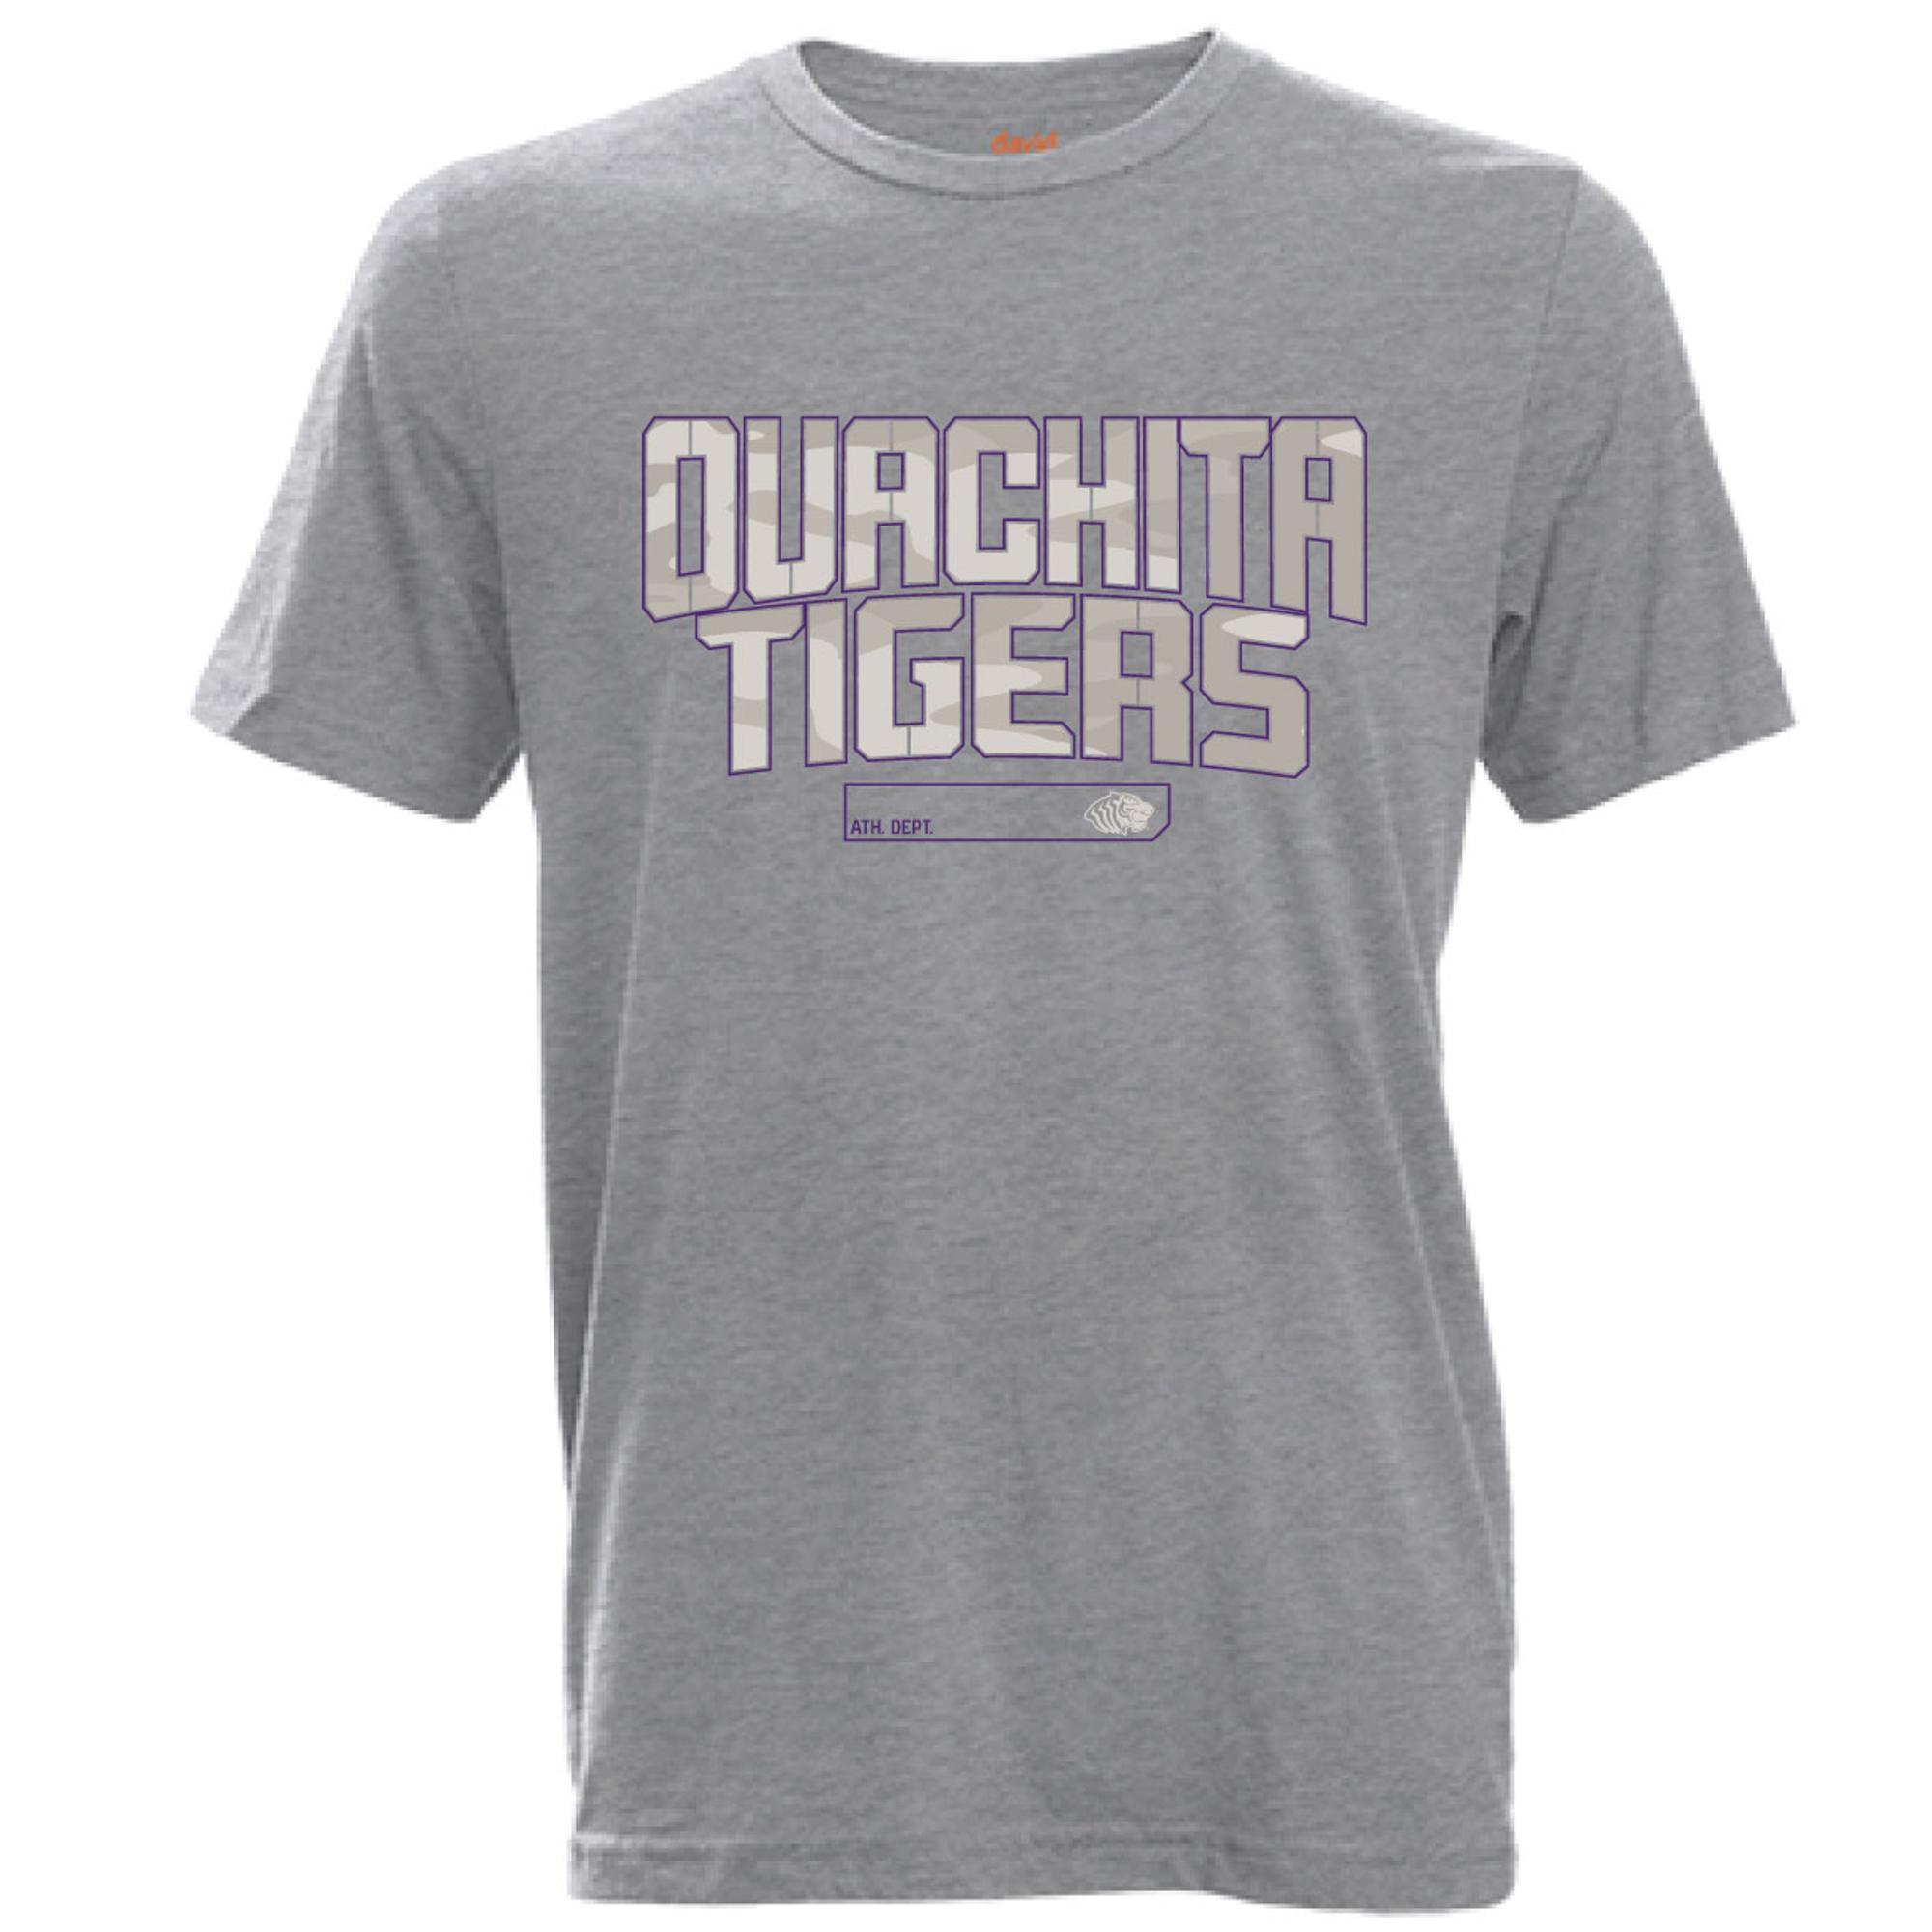 image of: Ouachita Cruiser Tee